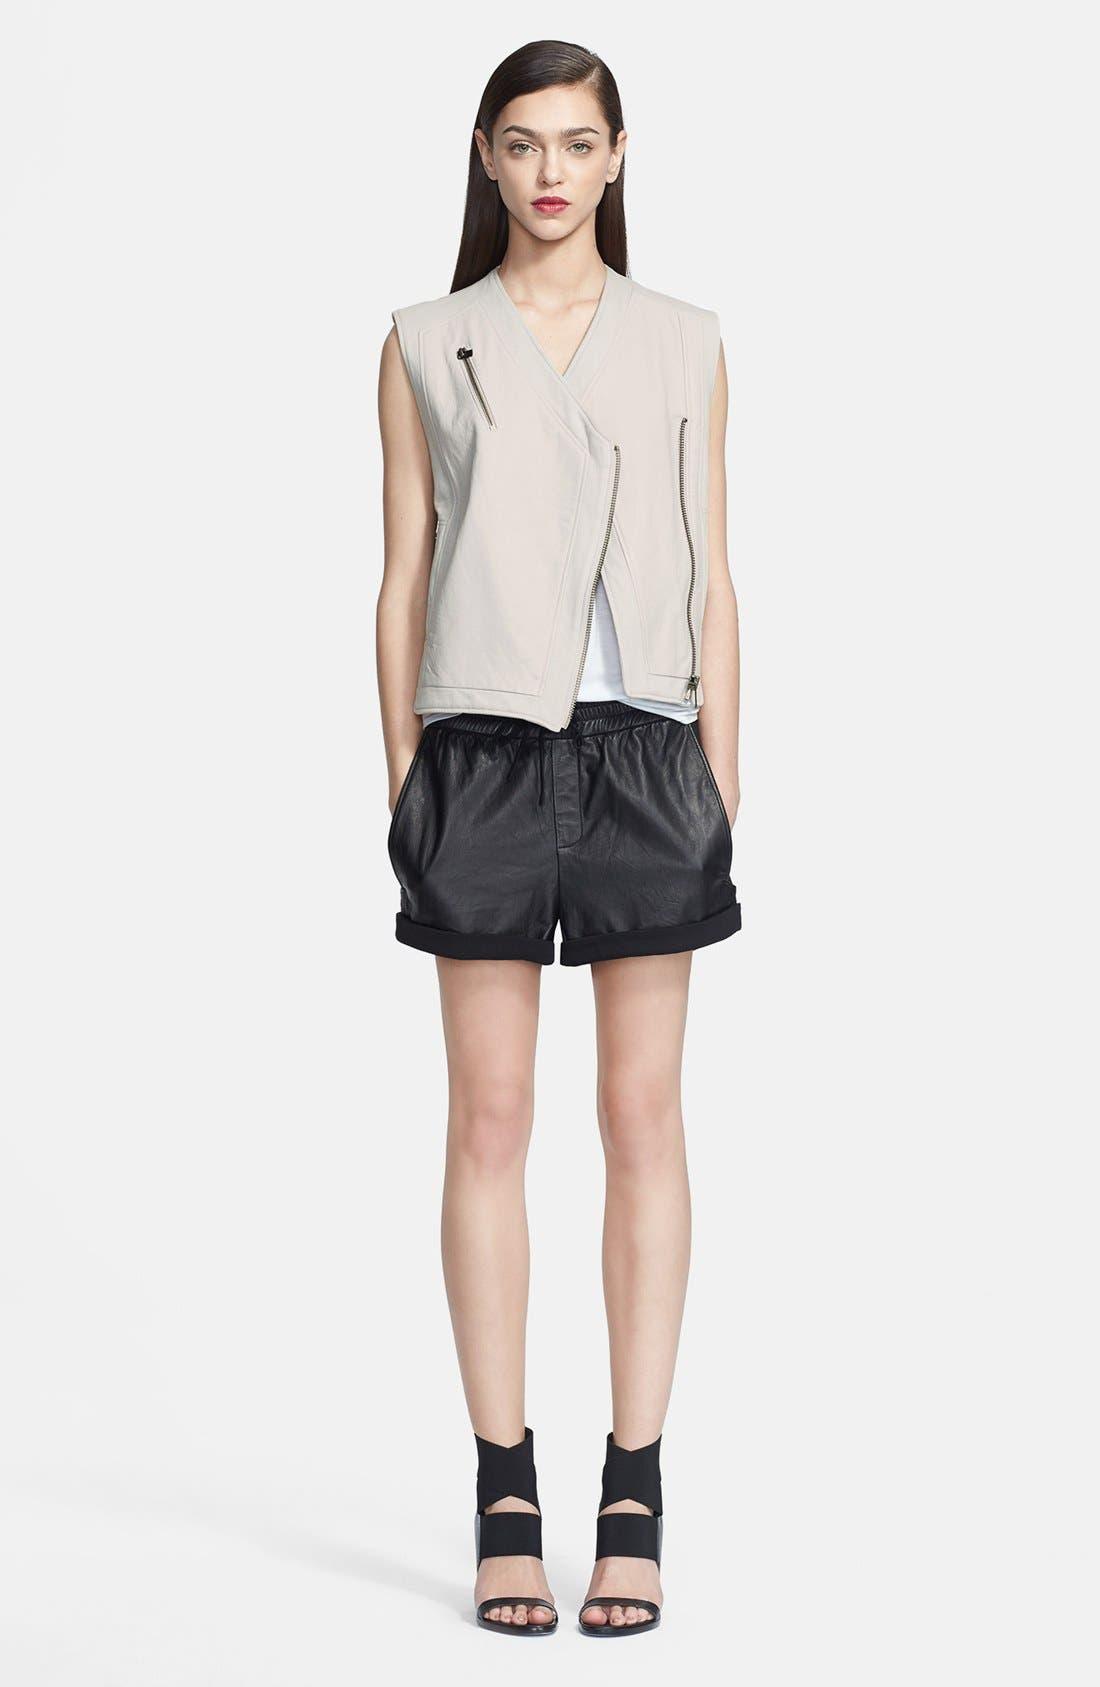 Main Image - Helmut Lang Leather Vest & Shorts